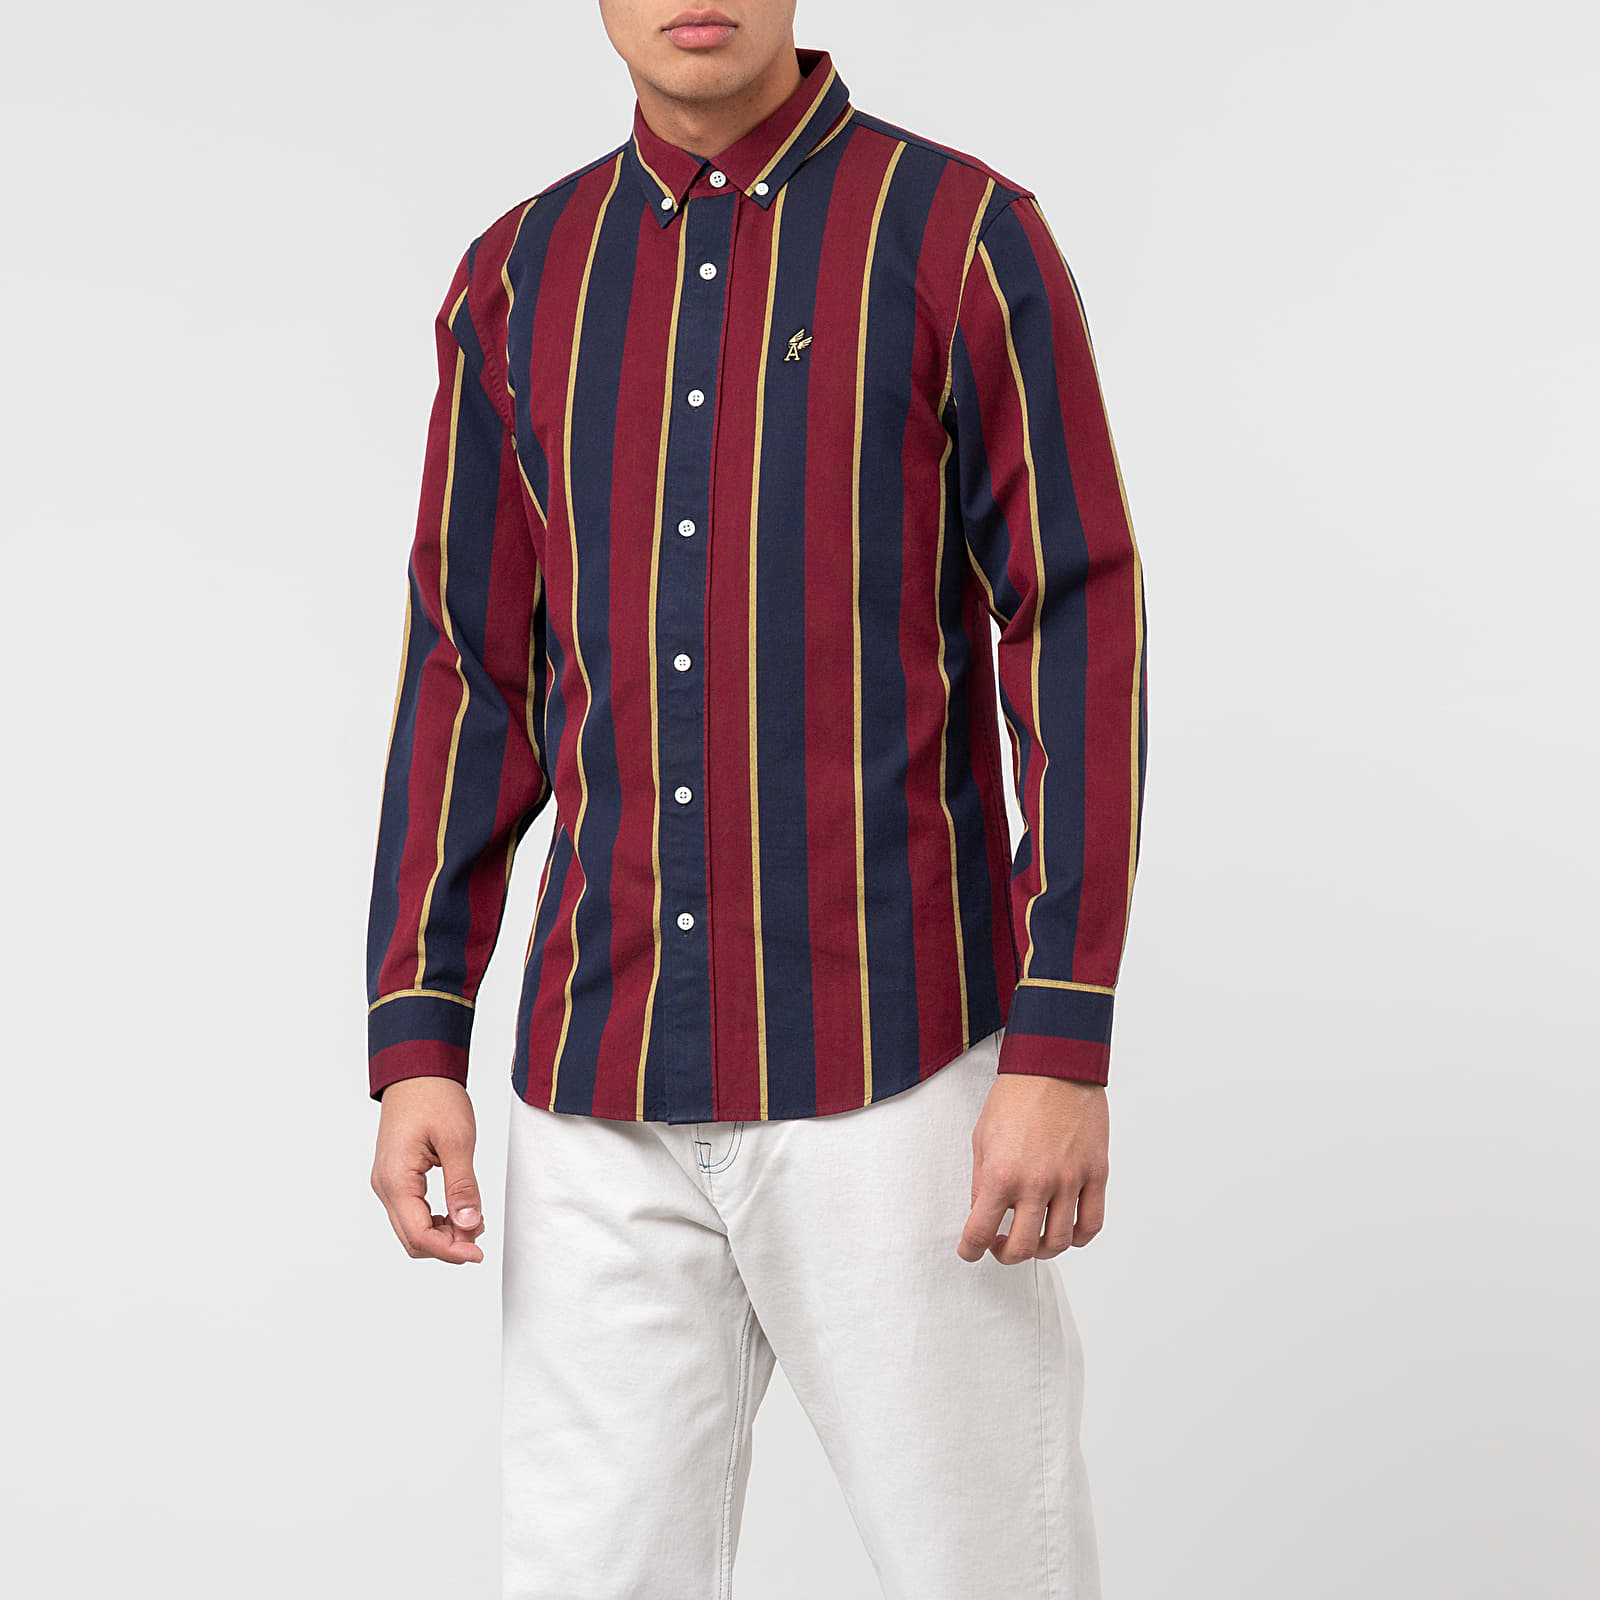 Hemden Aimé Leon Dore Striped A-Wing Oxford Shirt Red Wine